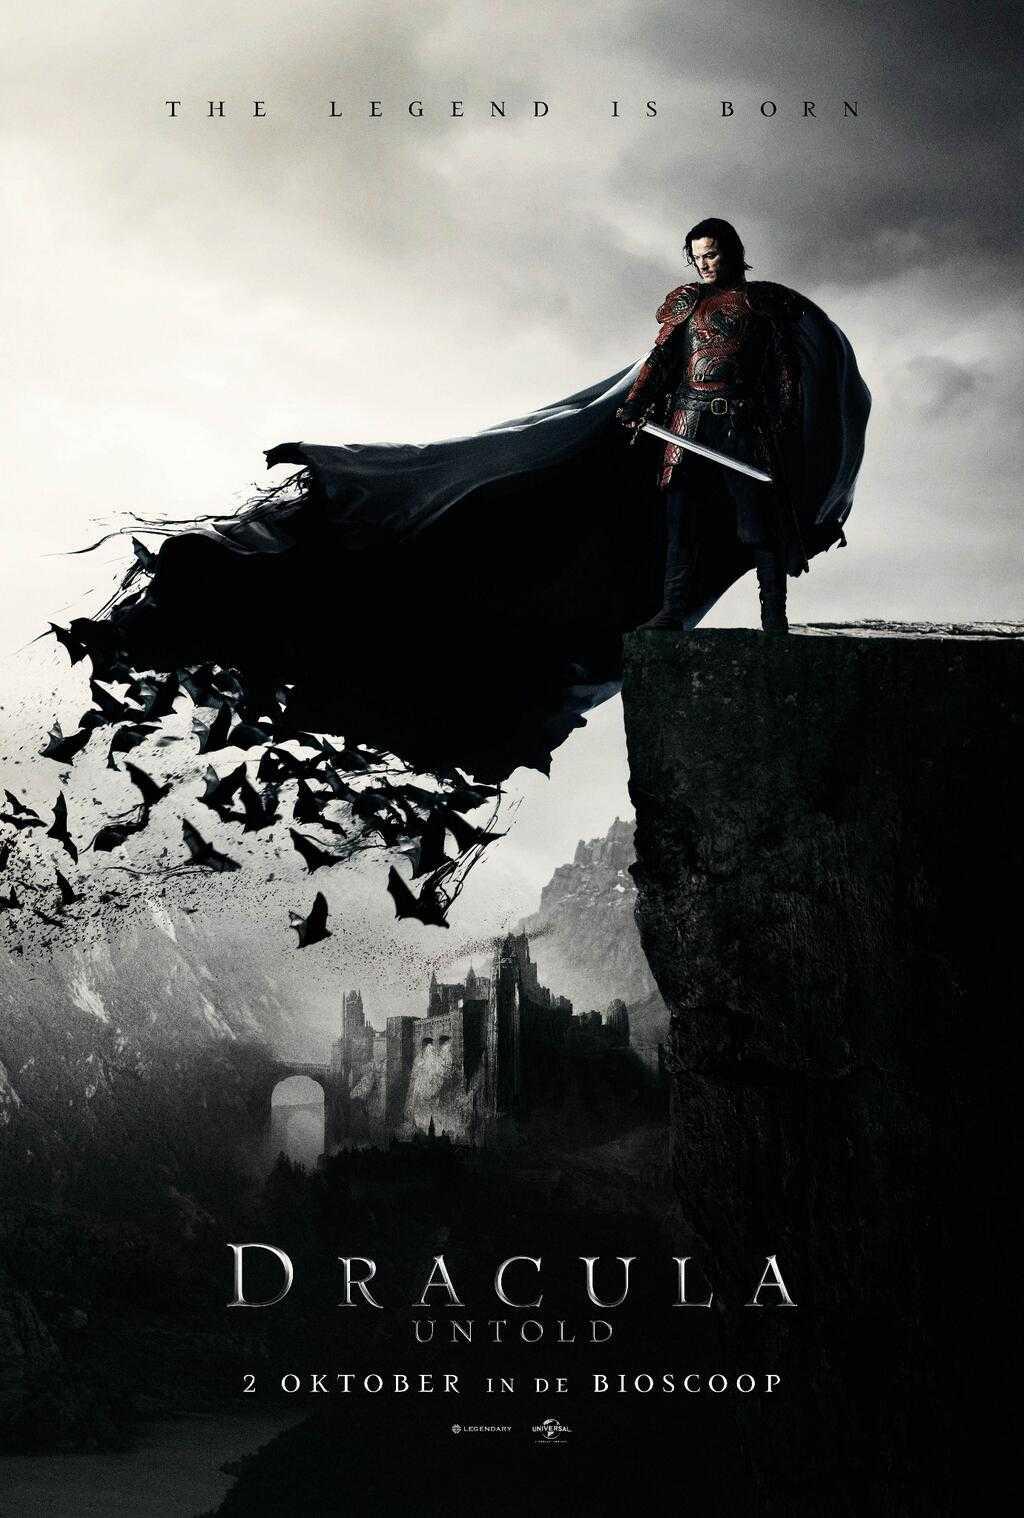 Dracula-untold-poster-nl